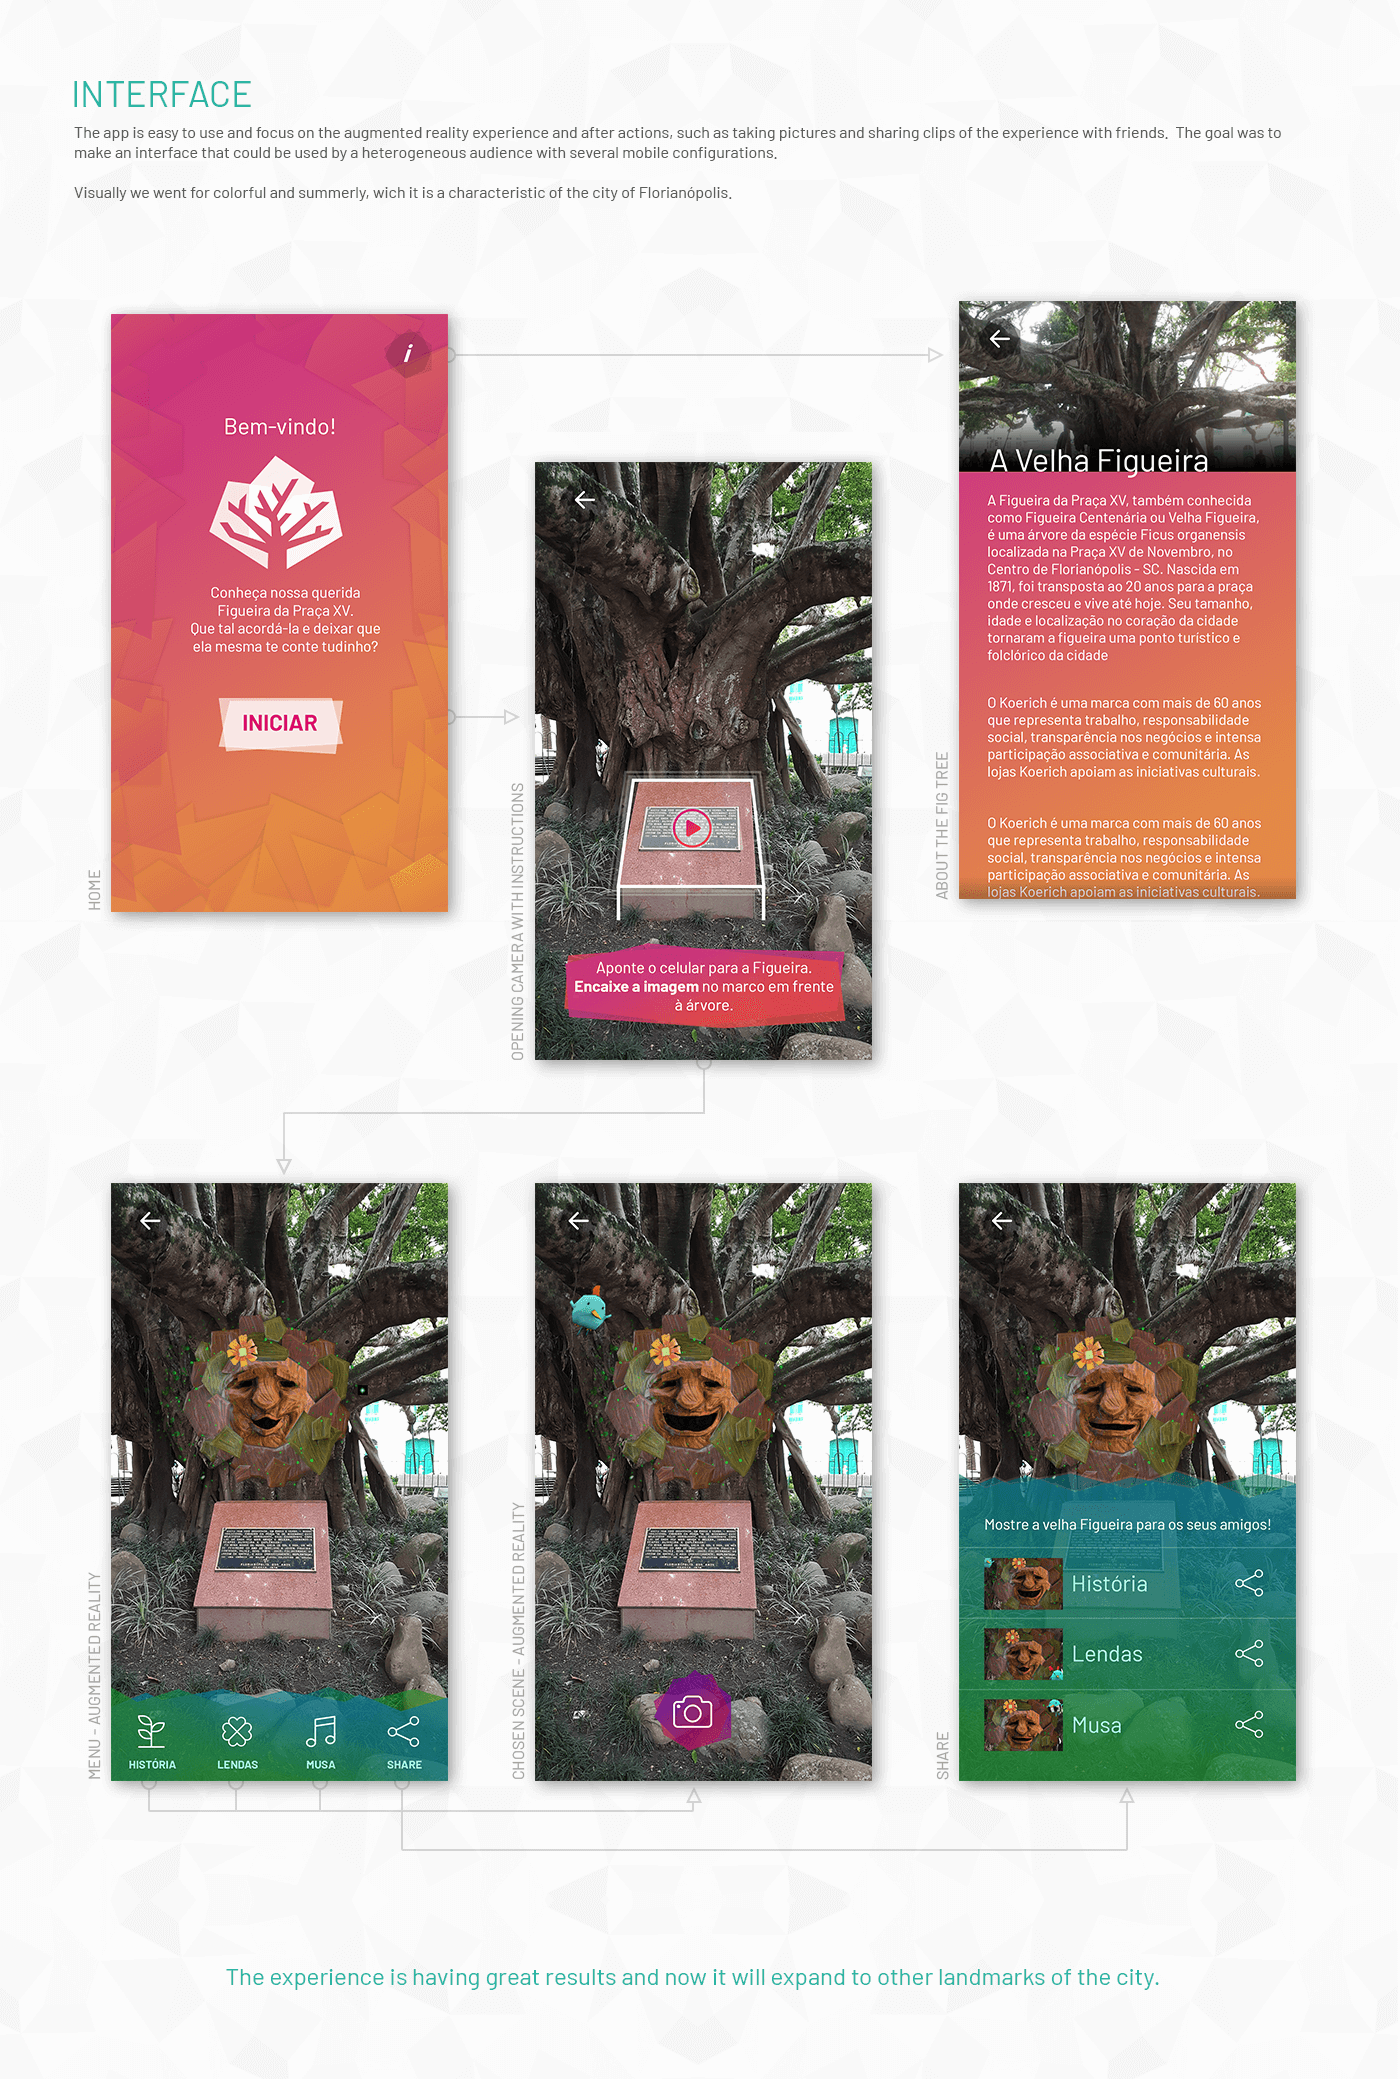 augmented reality app AR tourism legend Island Brazil Landmark Entertainment Mixed Reality